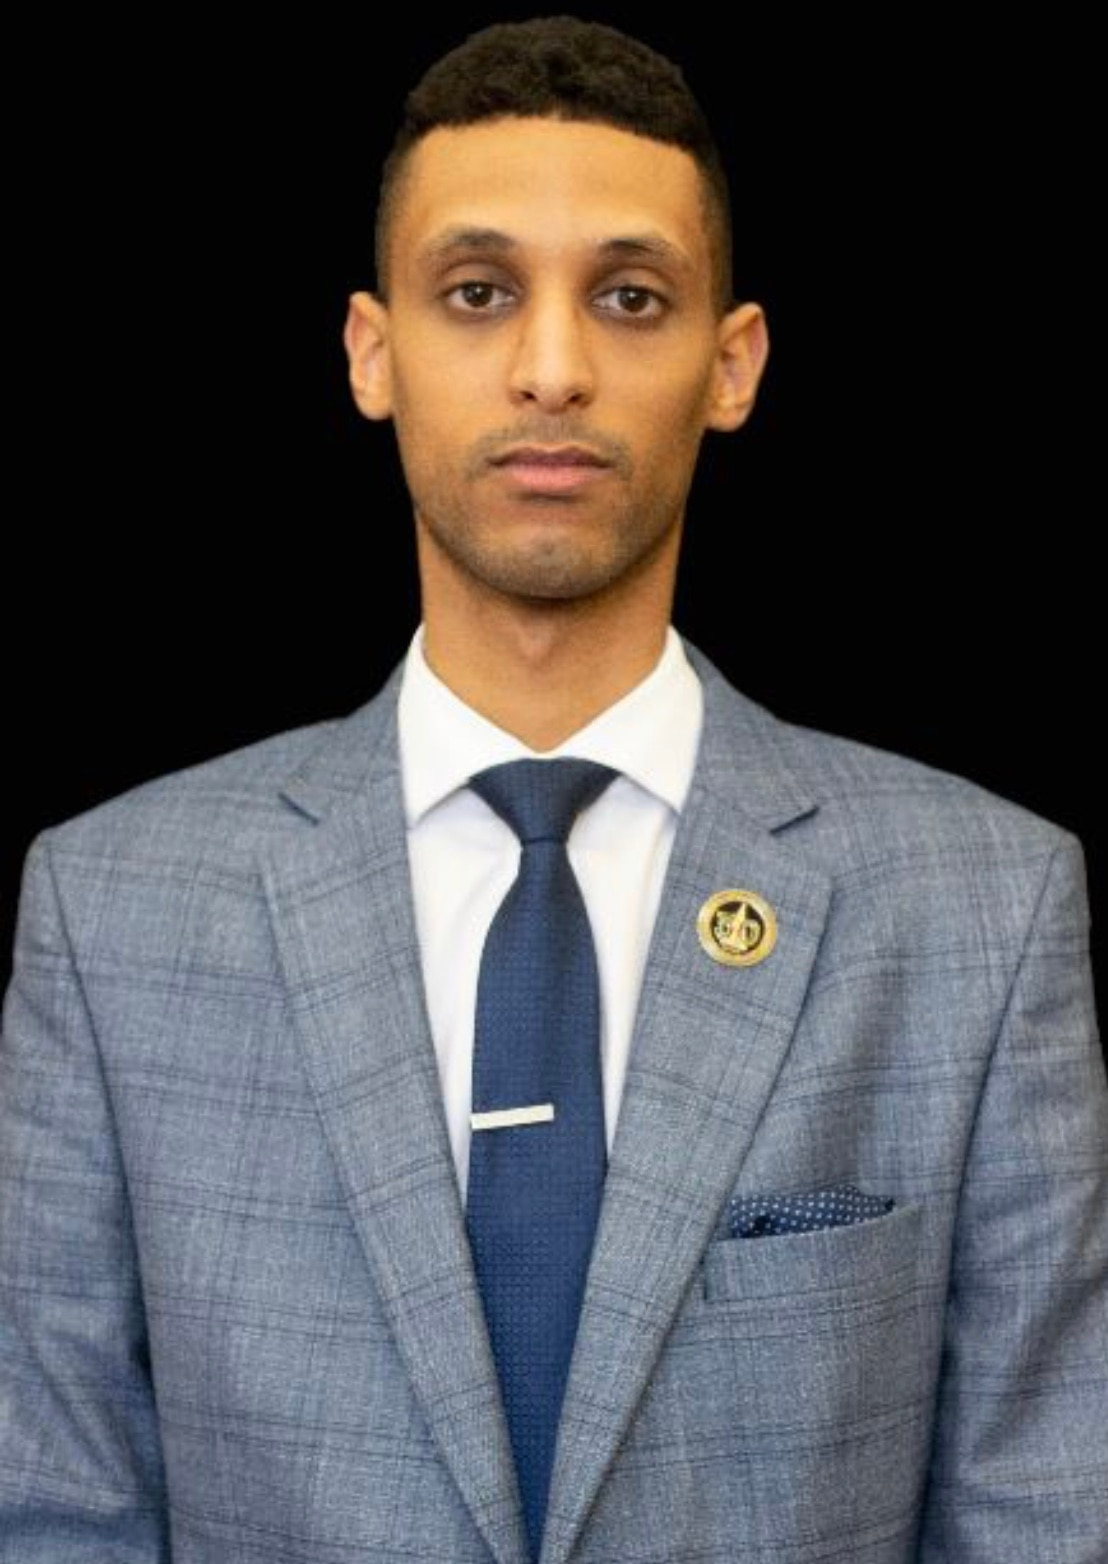 AMR KHAMIS BAKER  Your Financial Professional & Insurance Agent